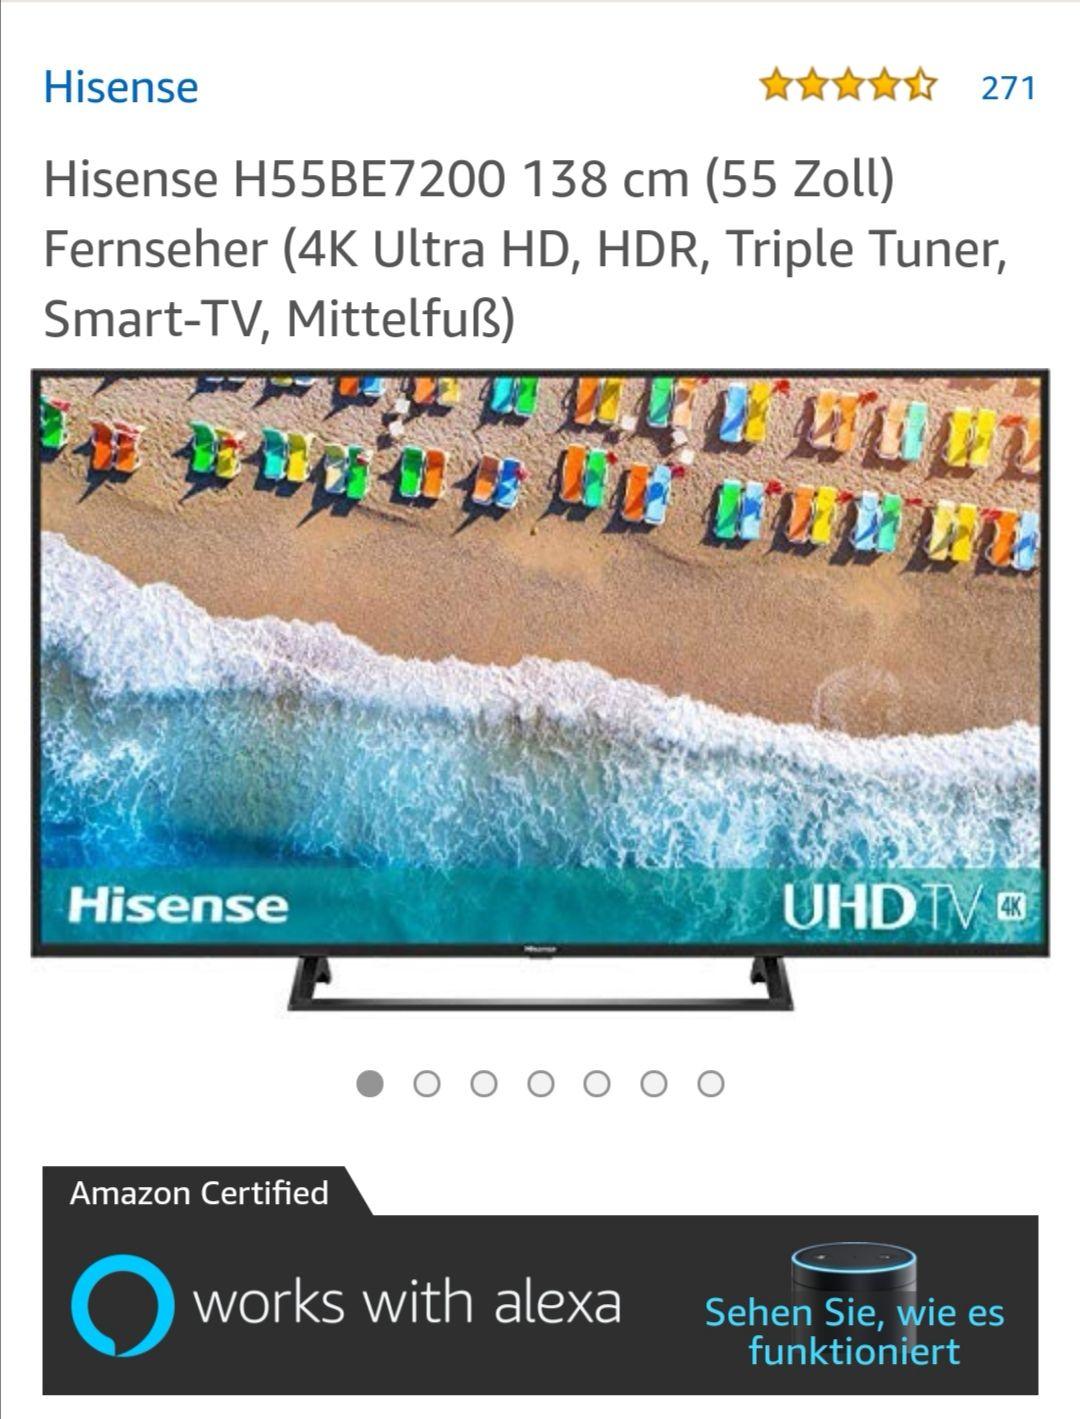 Hisense H55BE7200 138 cm (55 Zoll) Fernseher (4K Ultra HD, HDR, Triple Tuner, Smart-TV, Mittelfuß